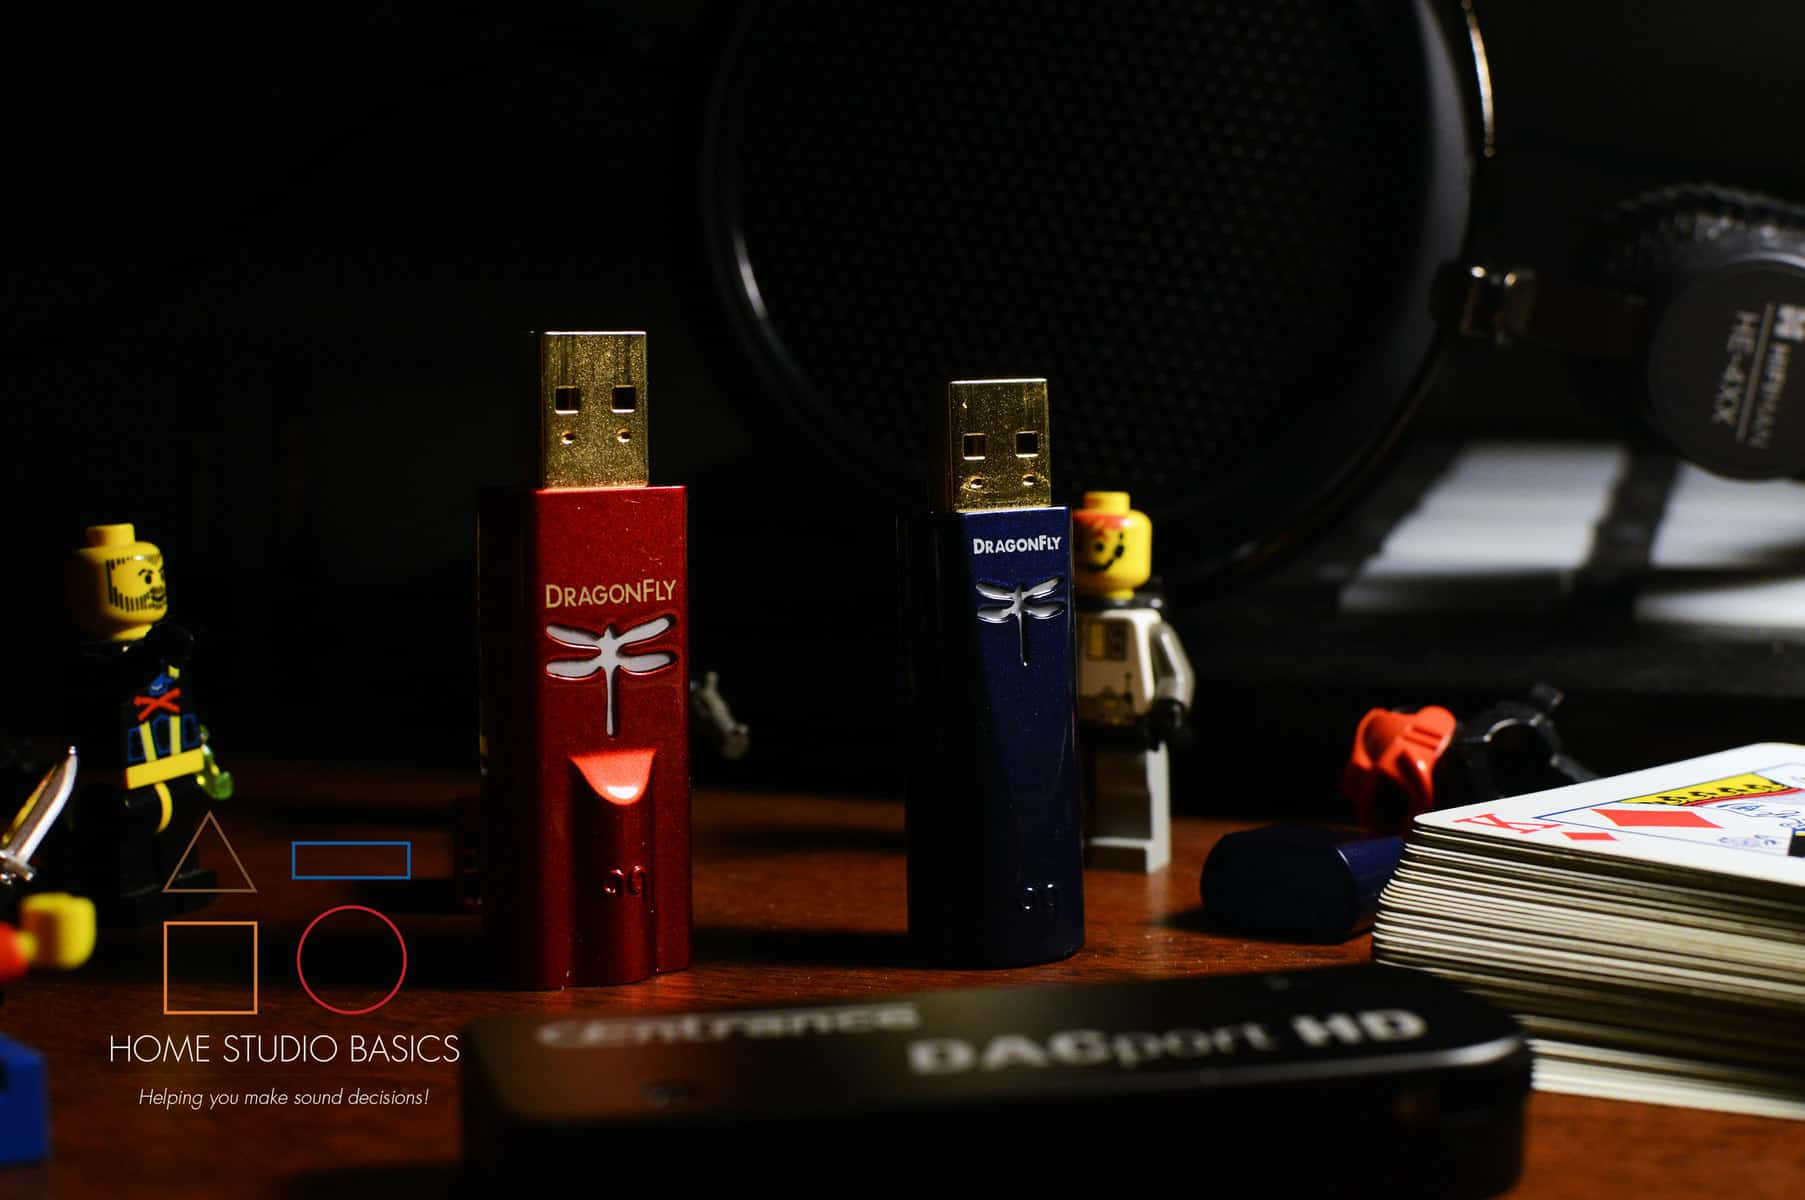 AudioQuest DragonFly Red vs. Cobalt vs. Chord Mojo